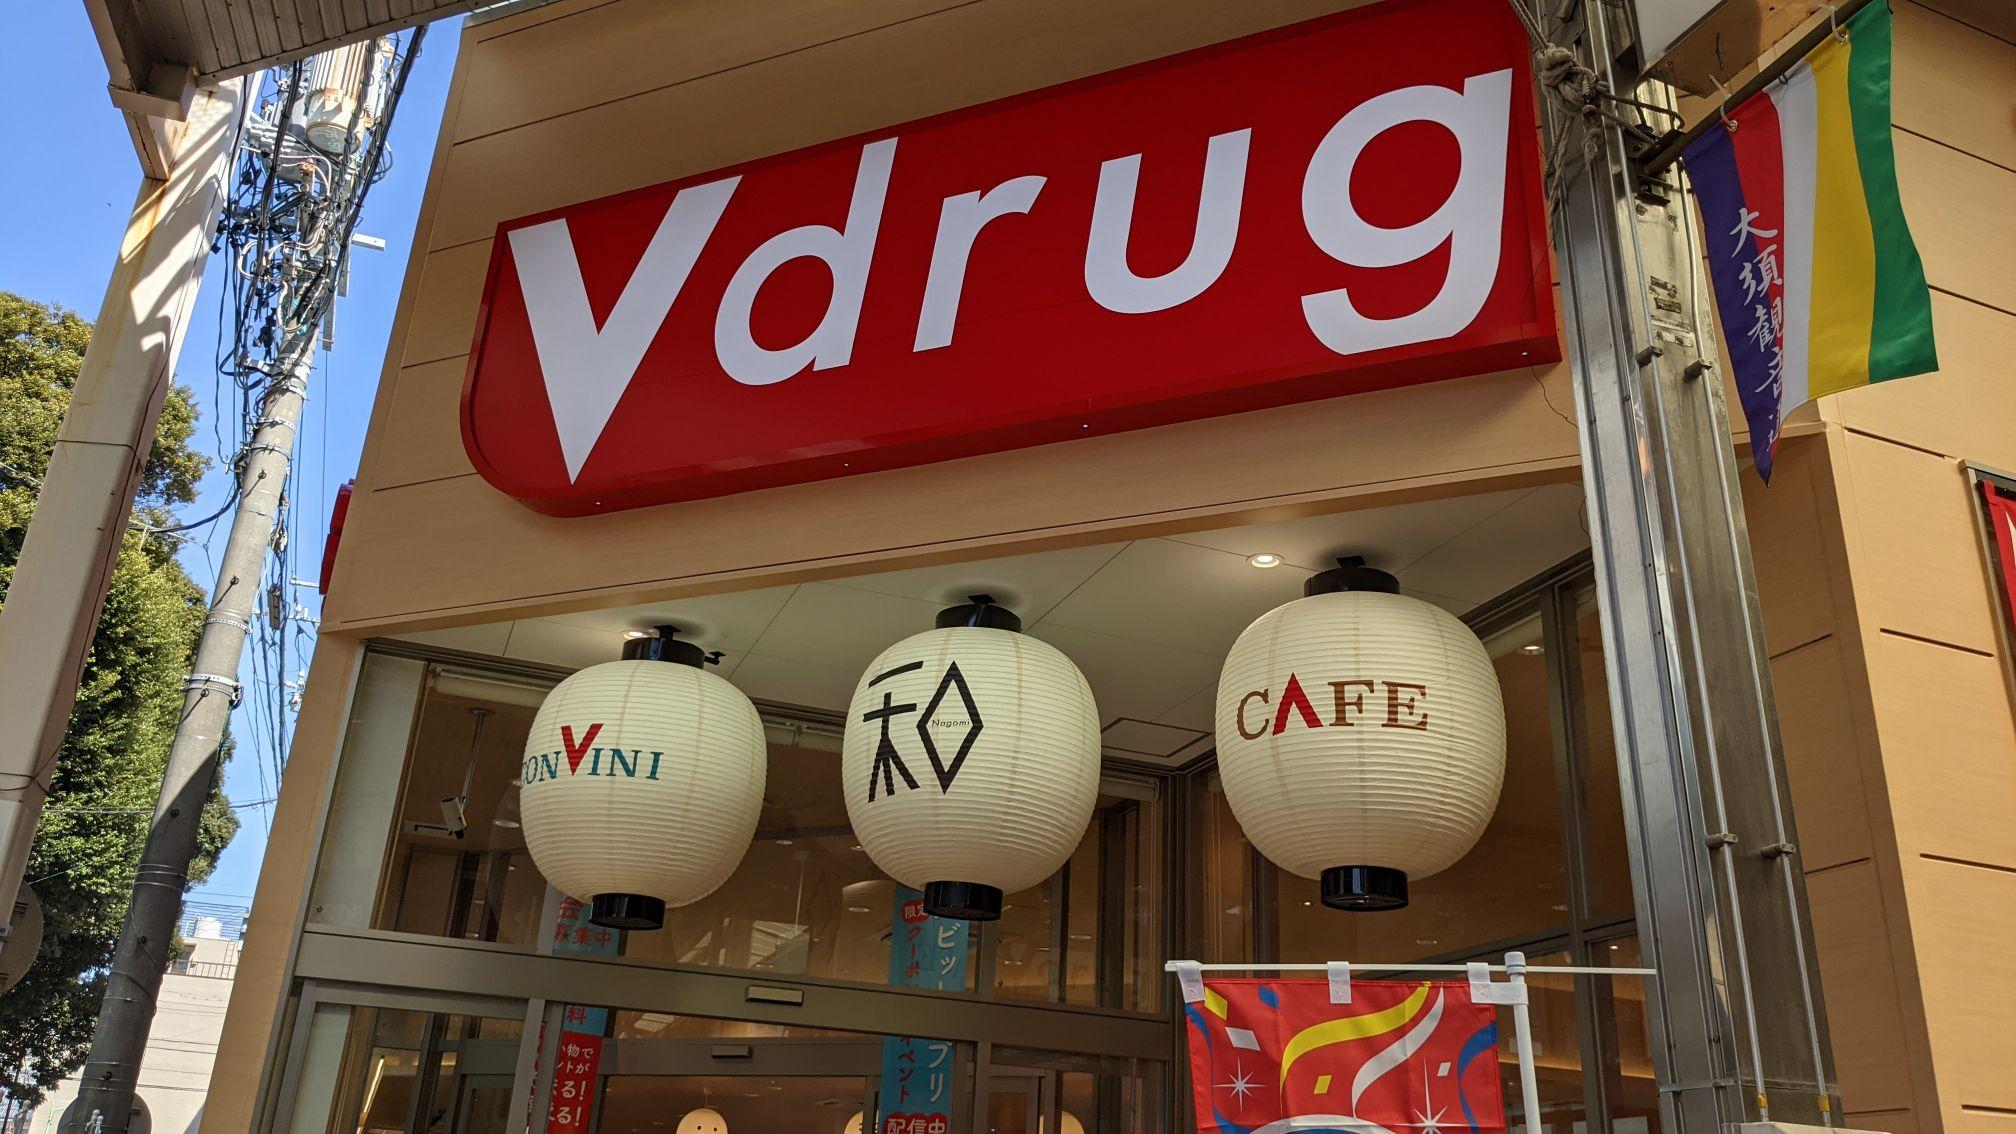 Vdrug(ブイドラッグ)大須店の外観